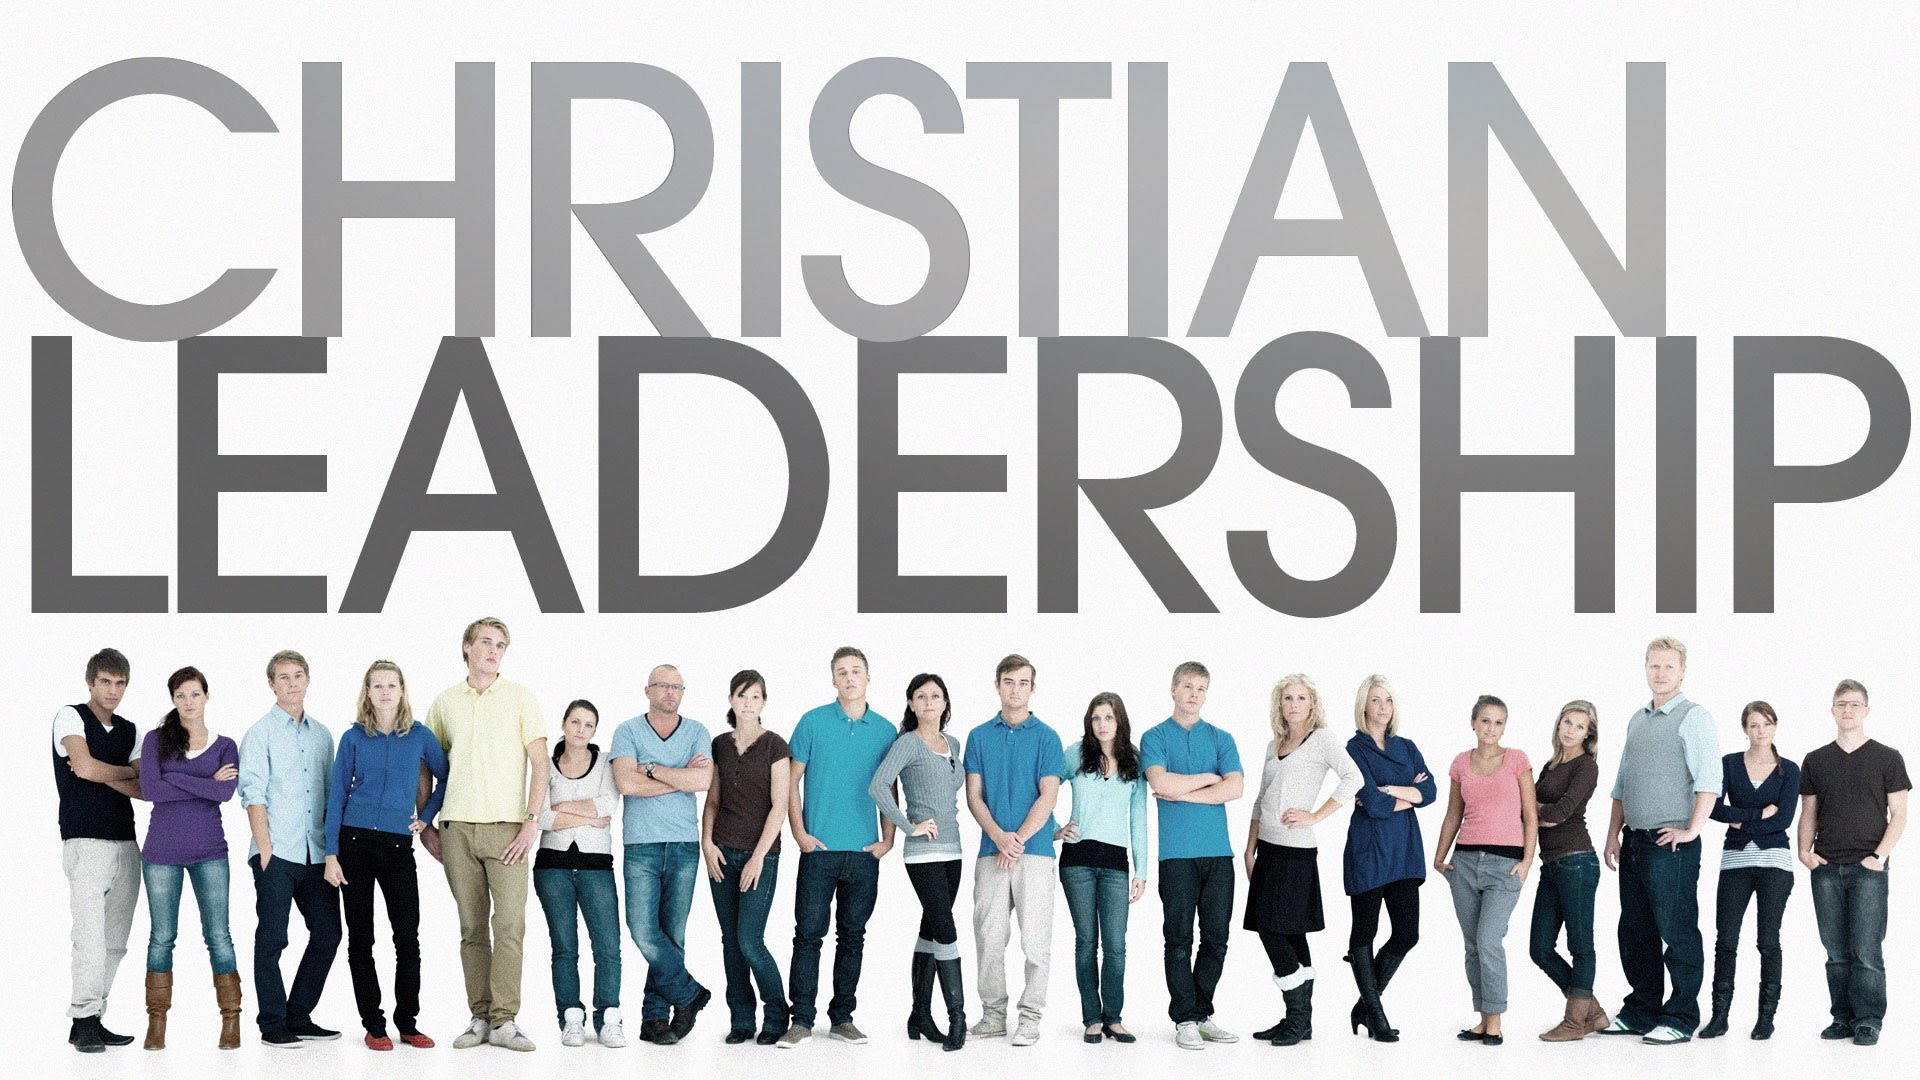 Free Church Leadership Cliparts, Download Free Clip Art, Free Clip.